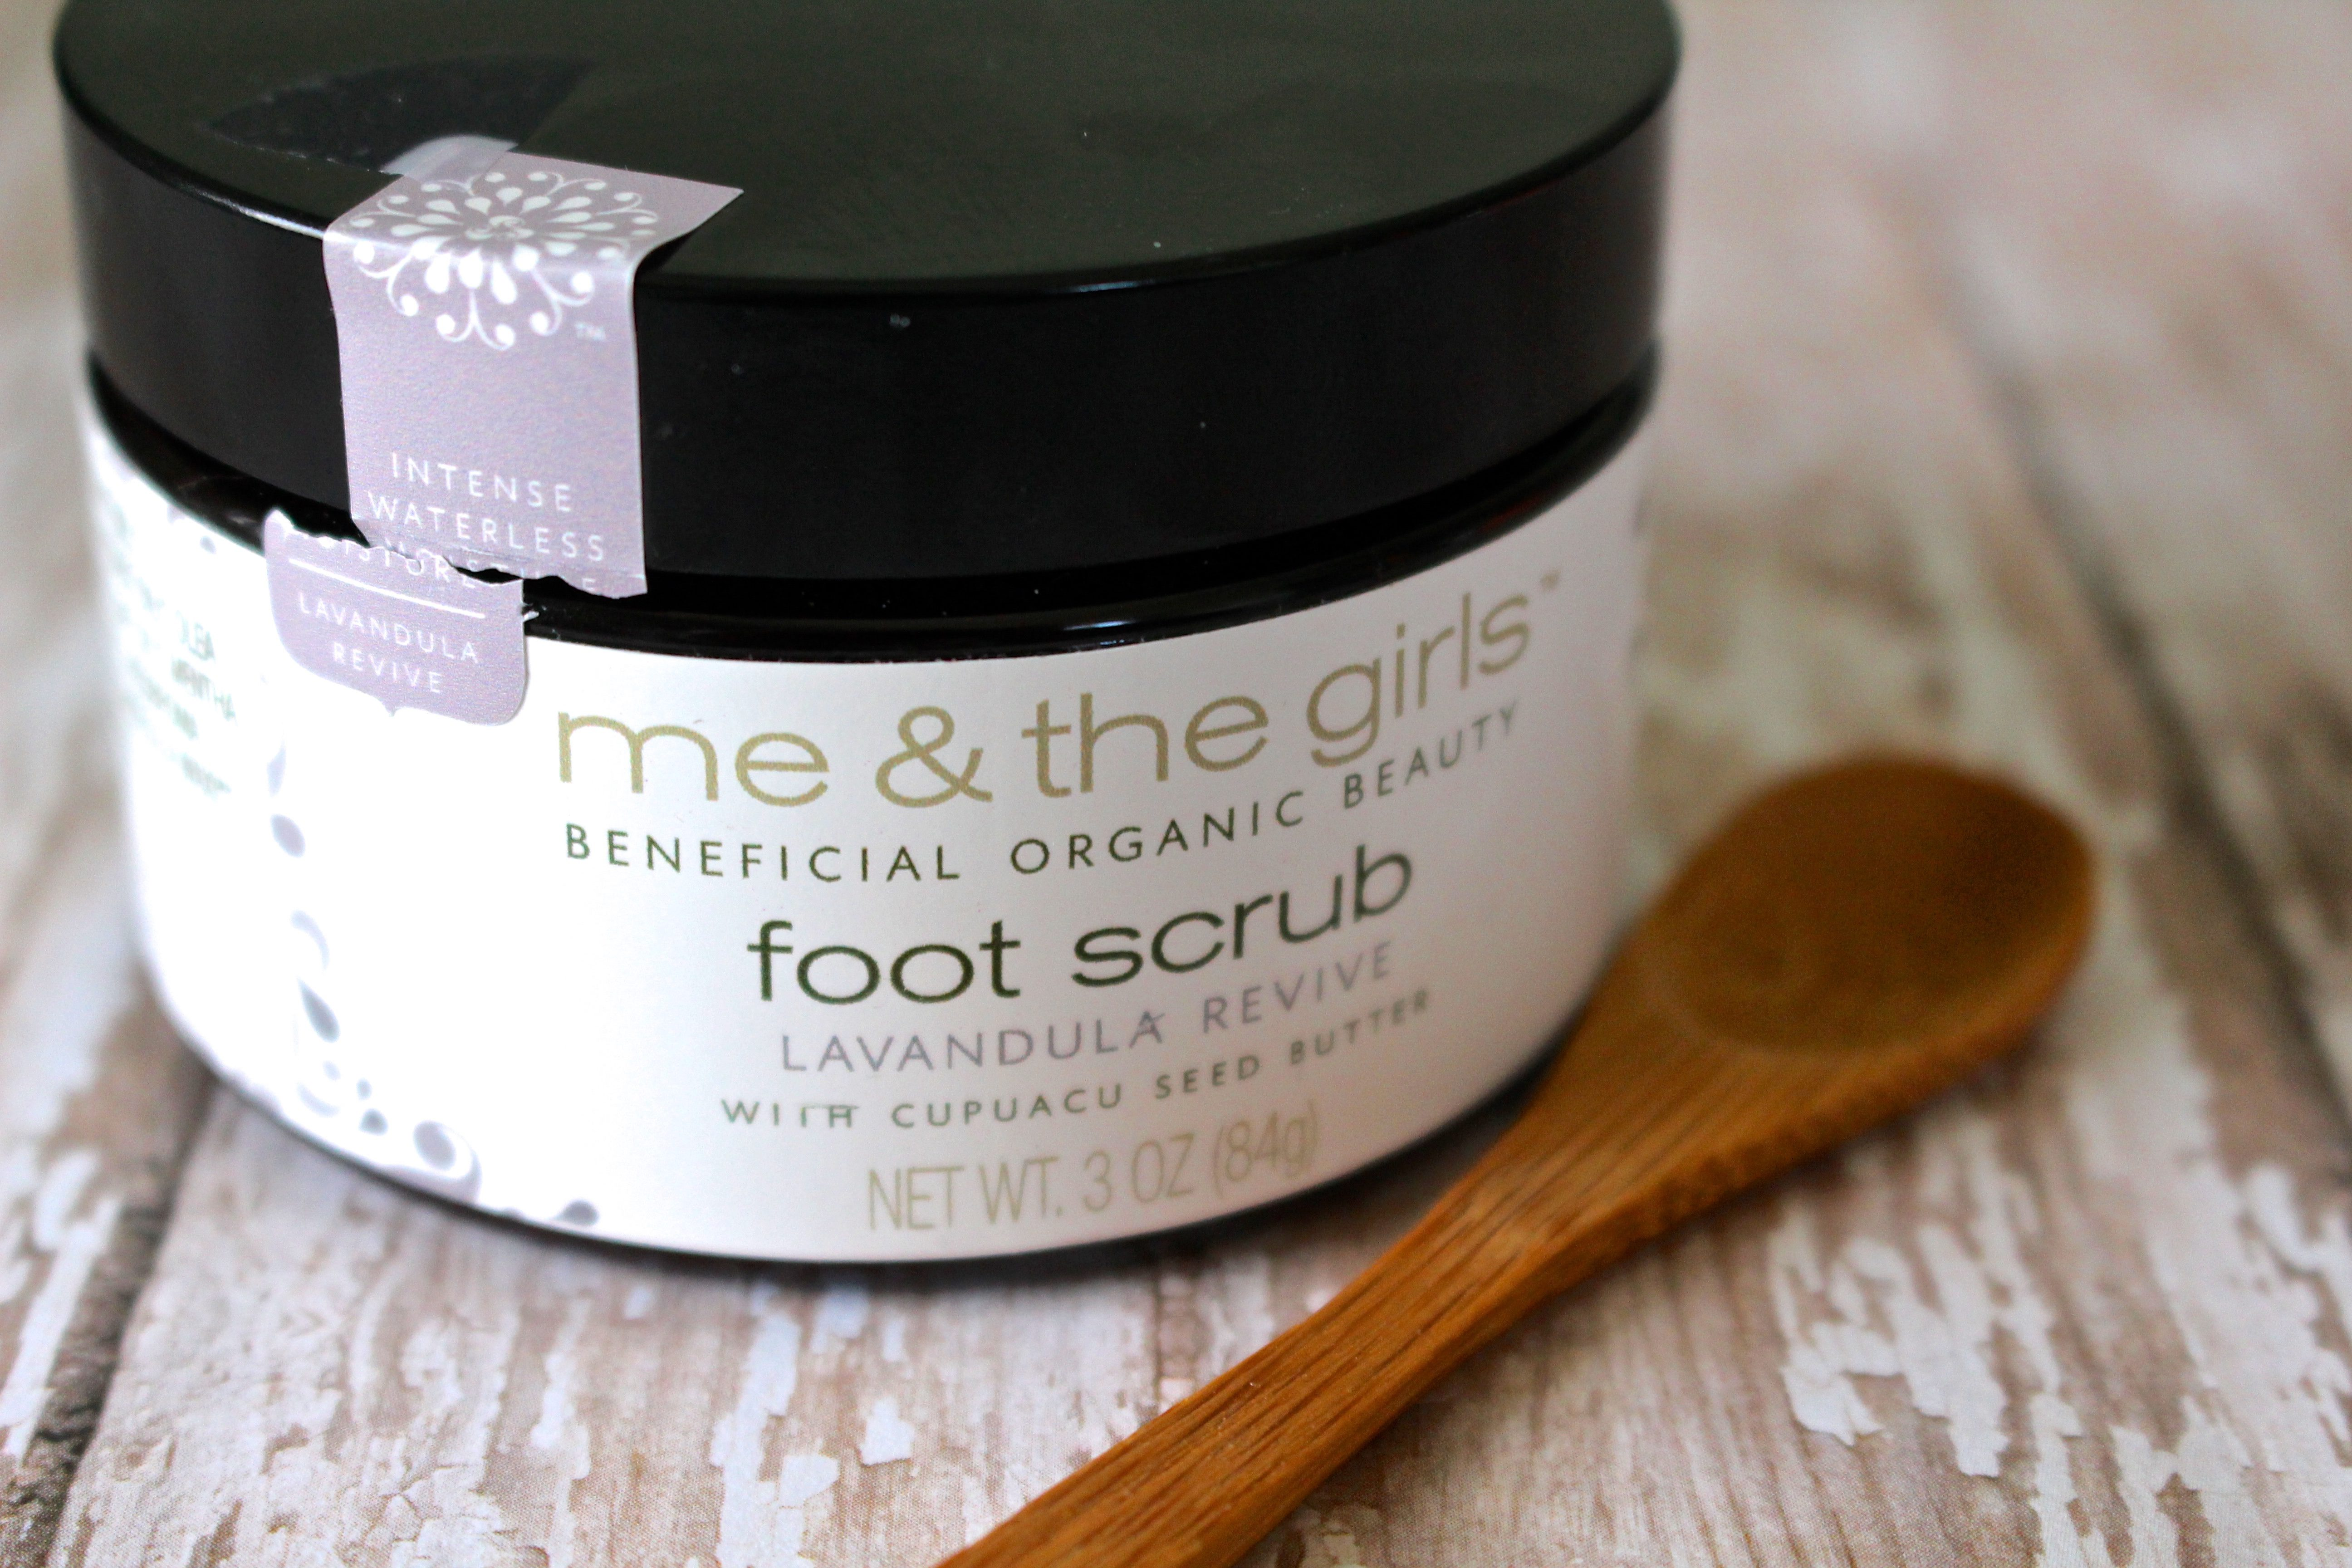 Me & The Girls Lavandula Revive Foot Scrub